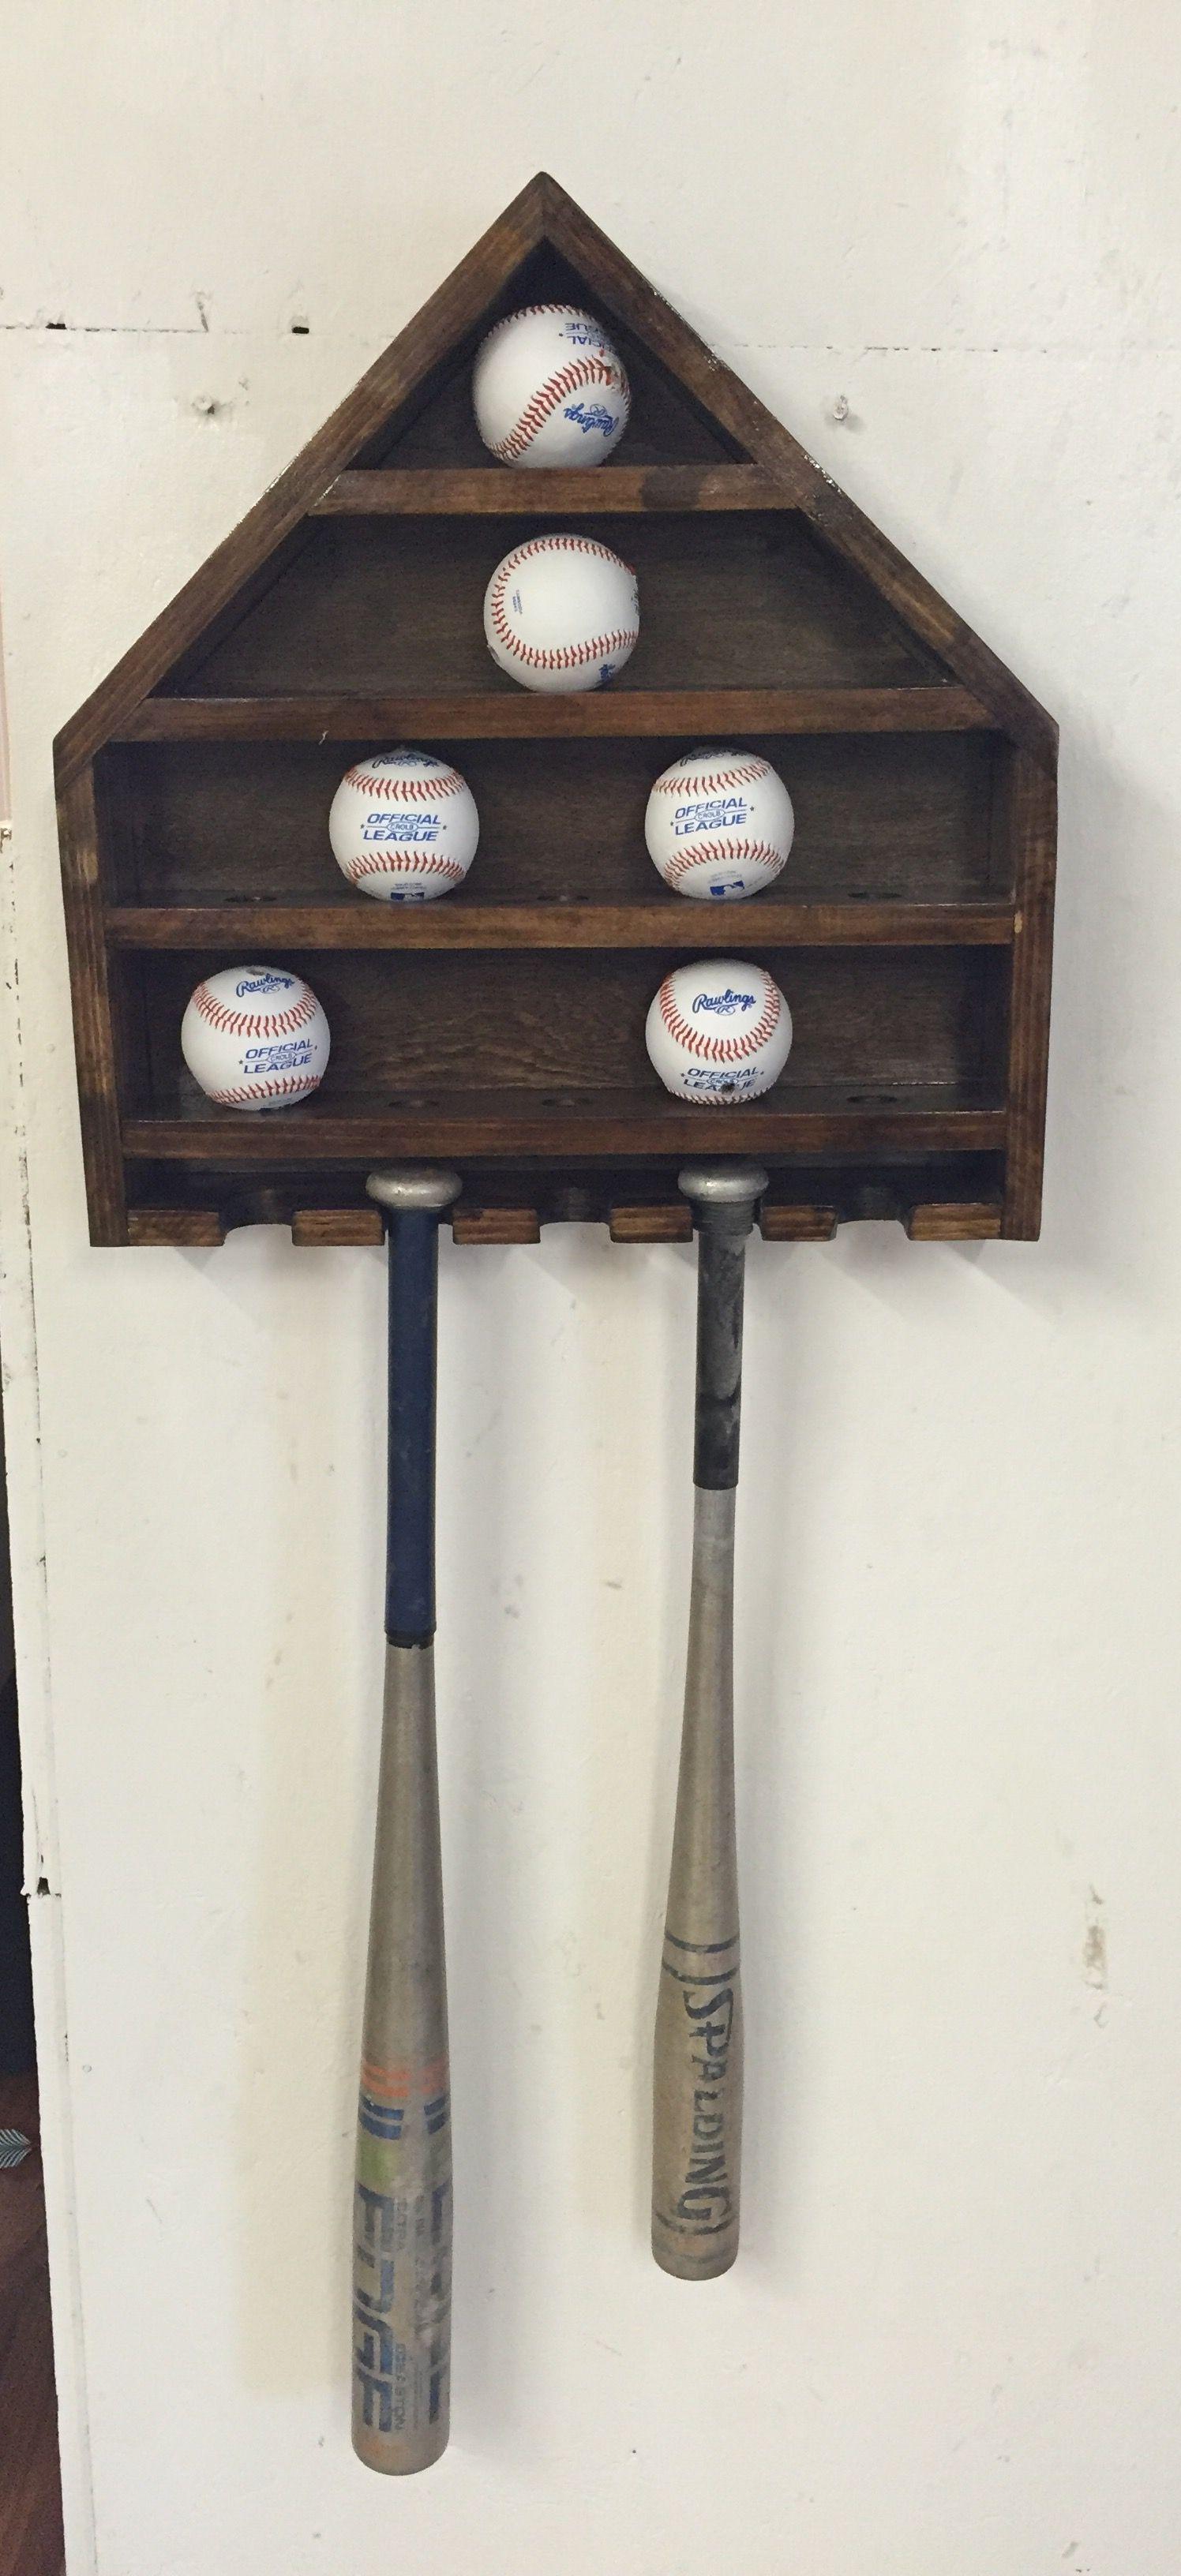 Baseball display shelf.